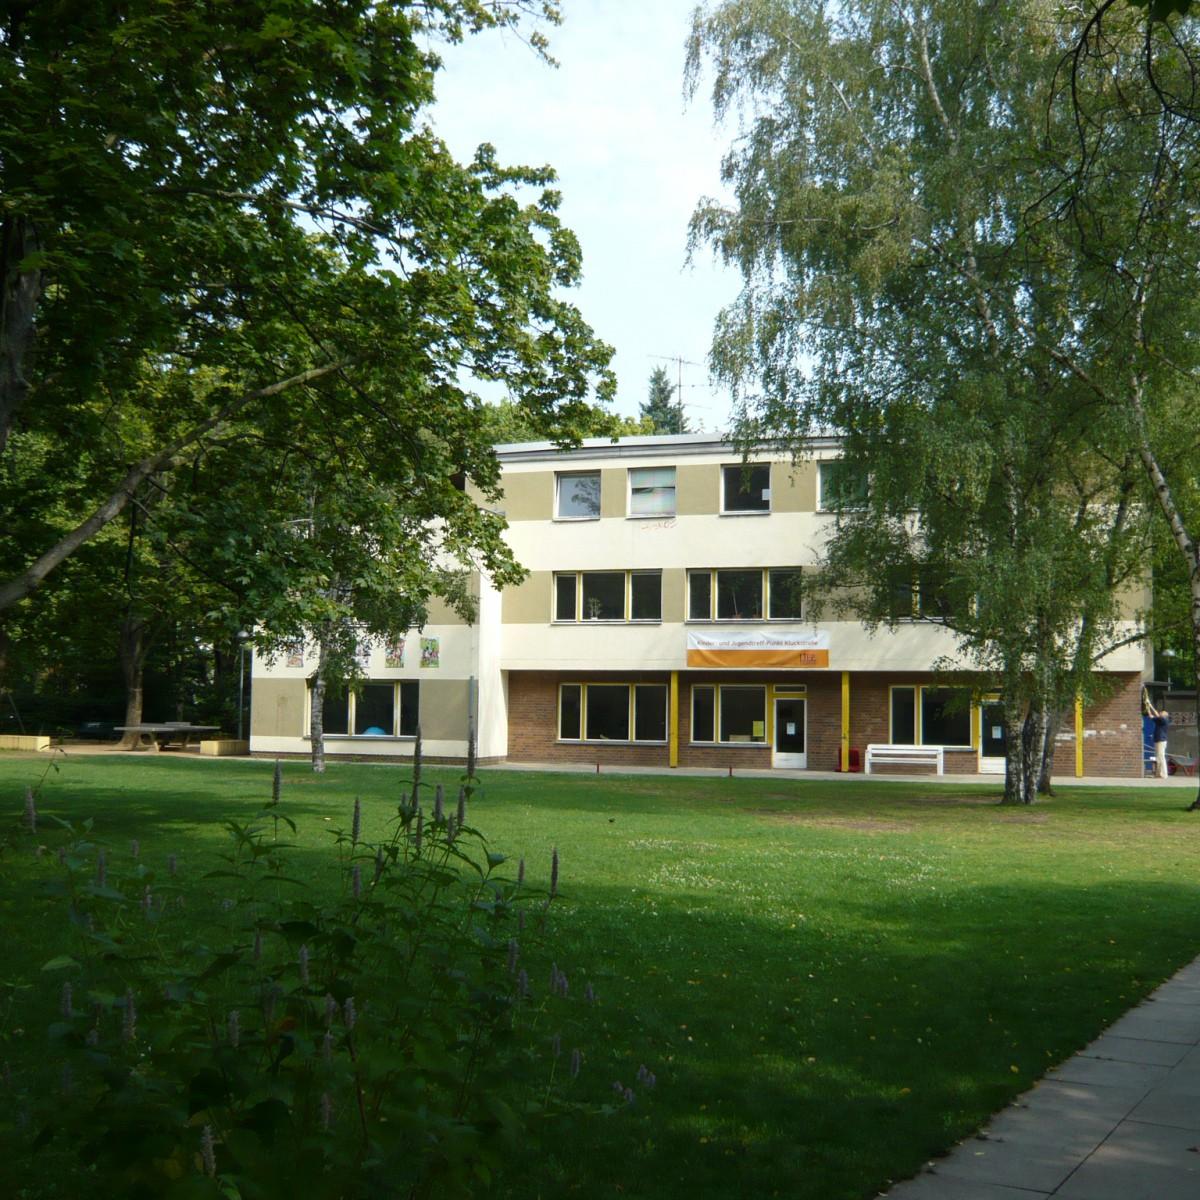 Jugendzentrum FIPP e.V. Kluckstrasse, Berlin